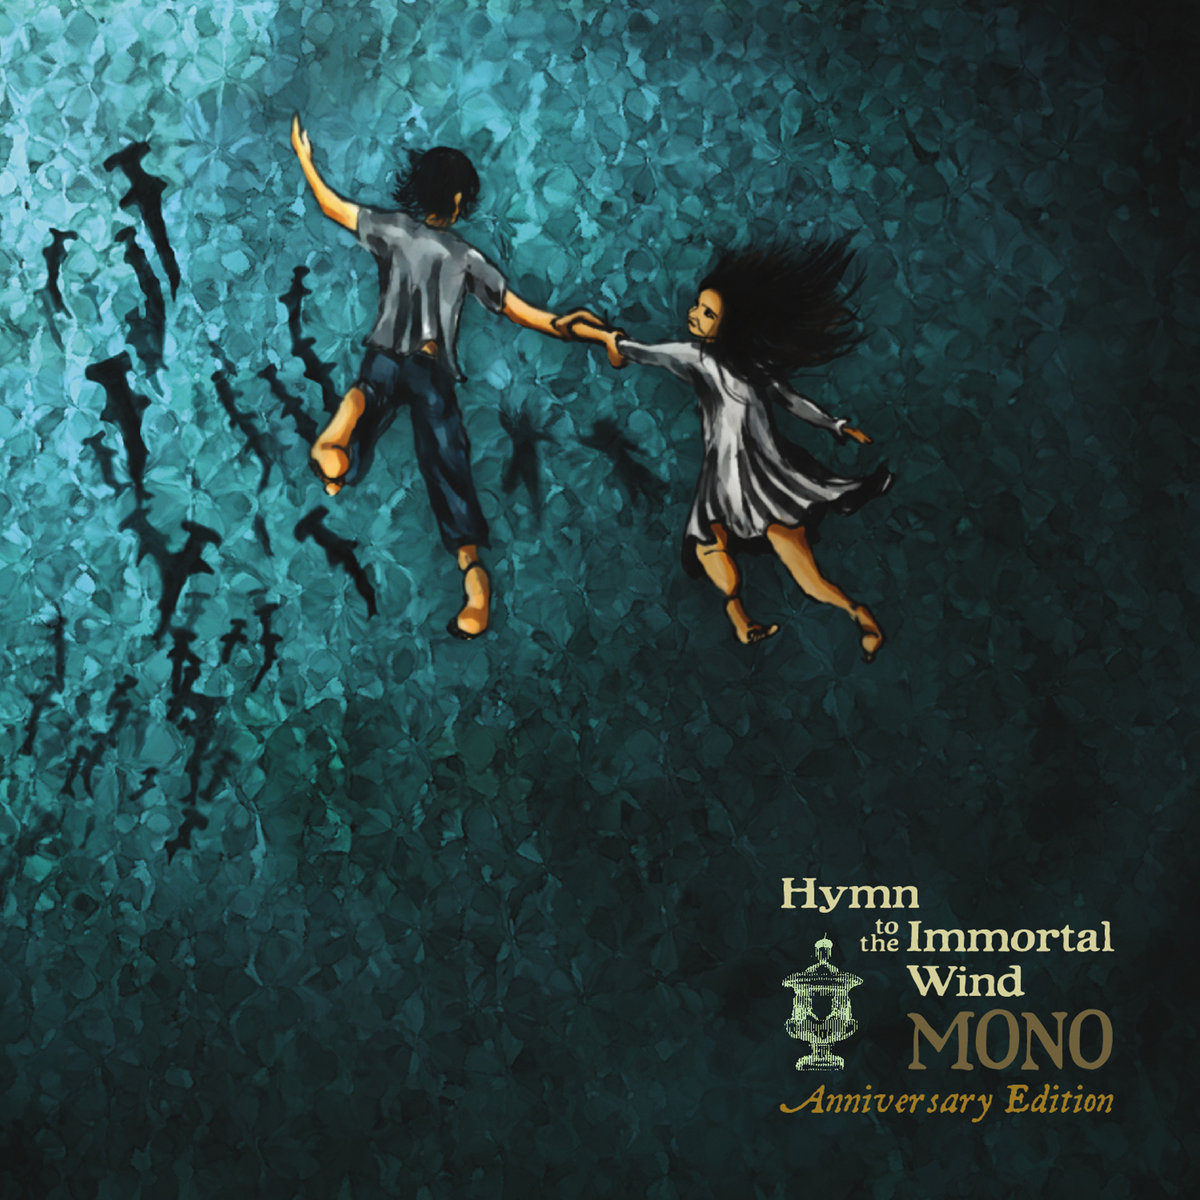 Hymn to the Immortal Wind – Anniversary Edition   MONO